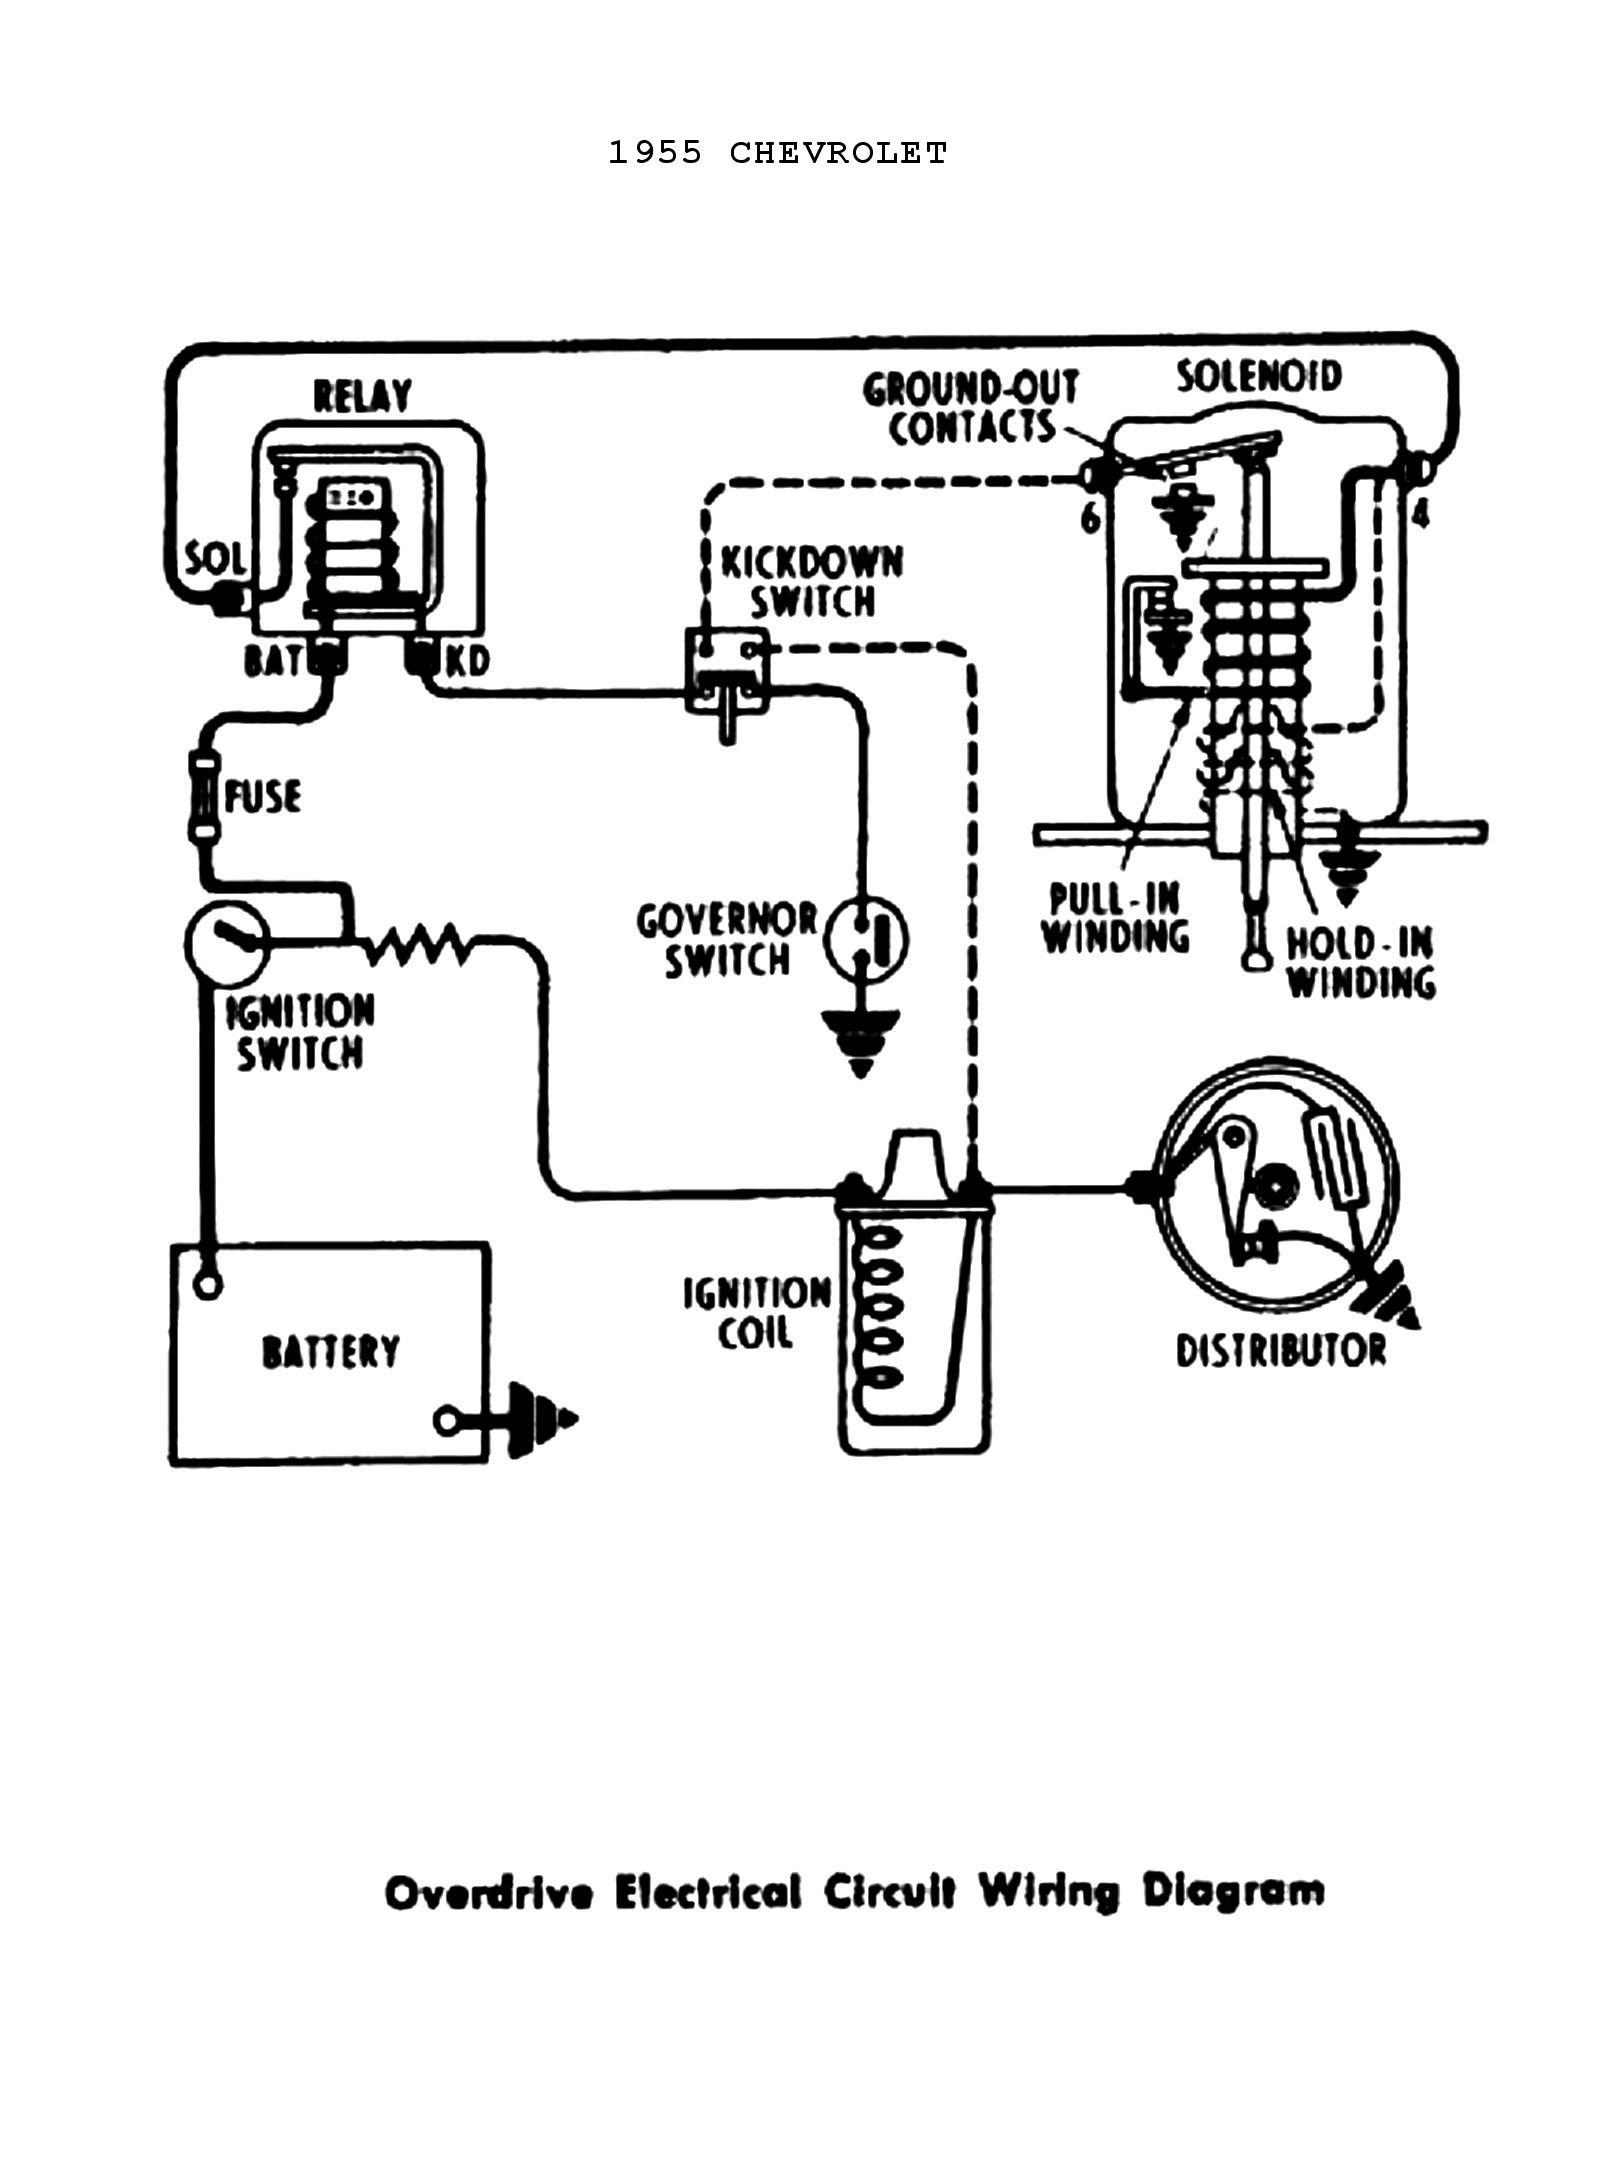 57 chevy truck wiring diagram